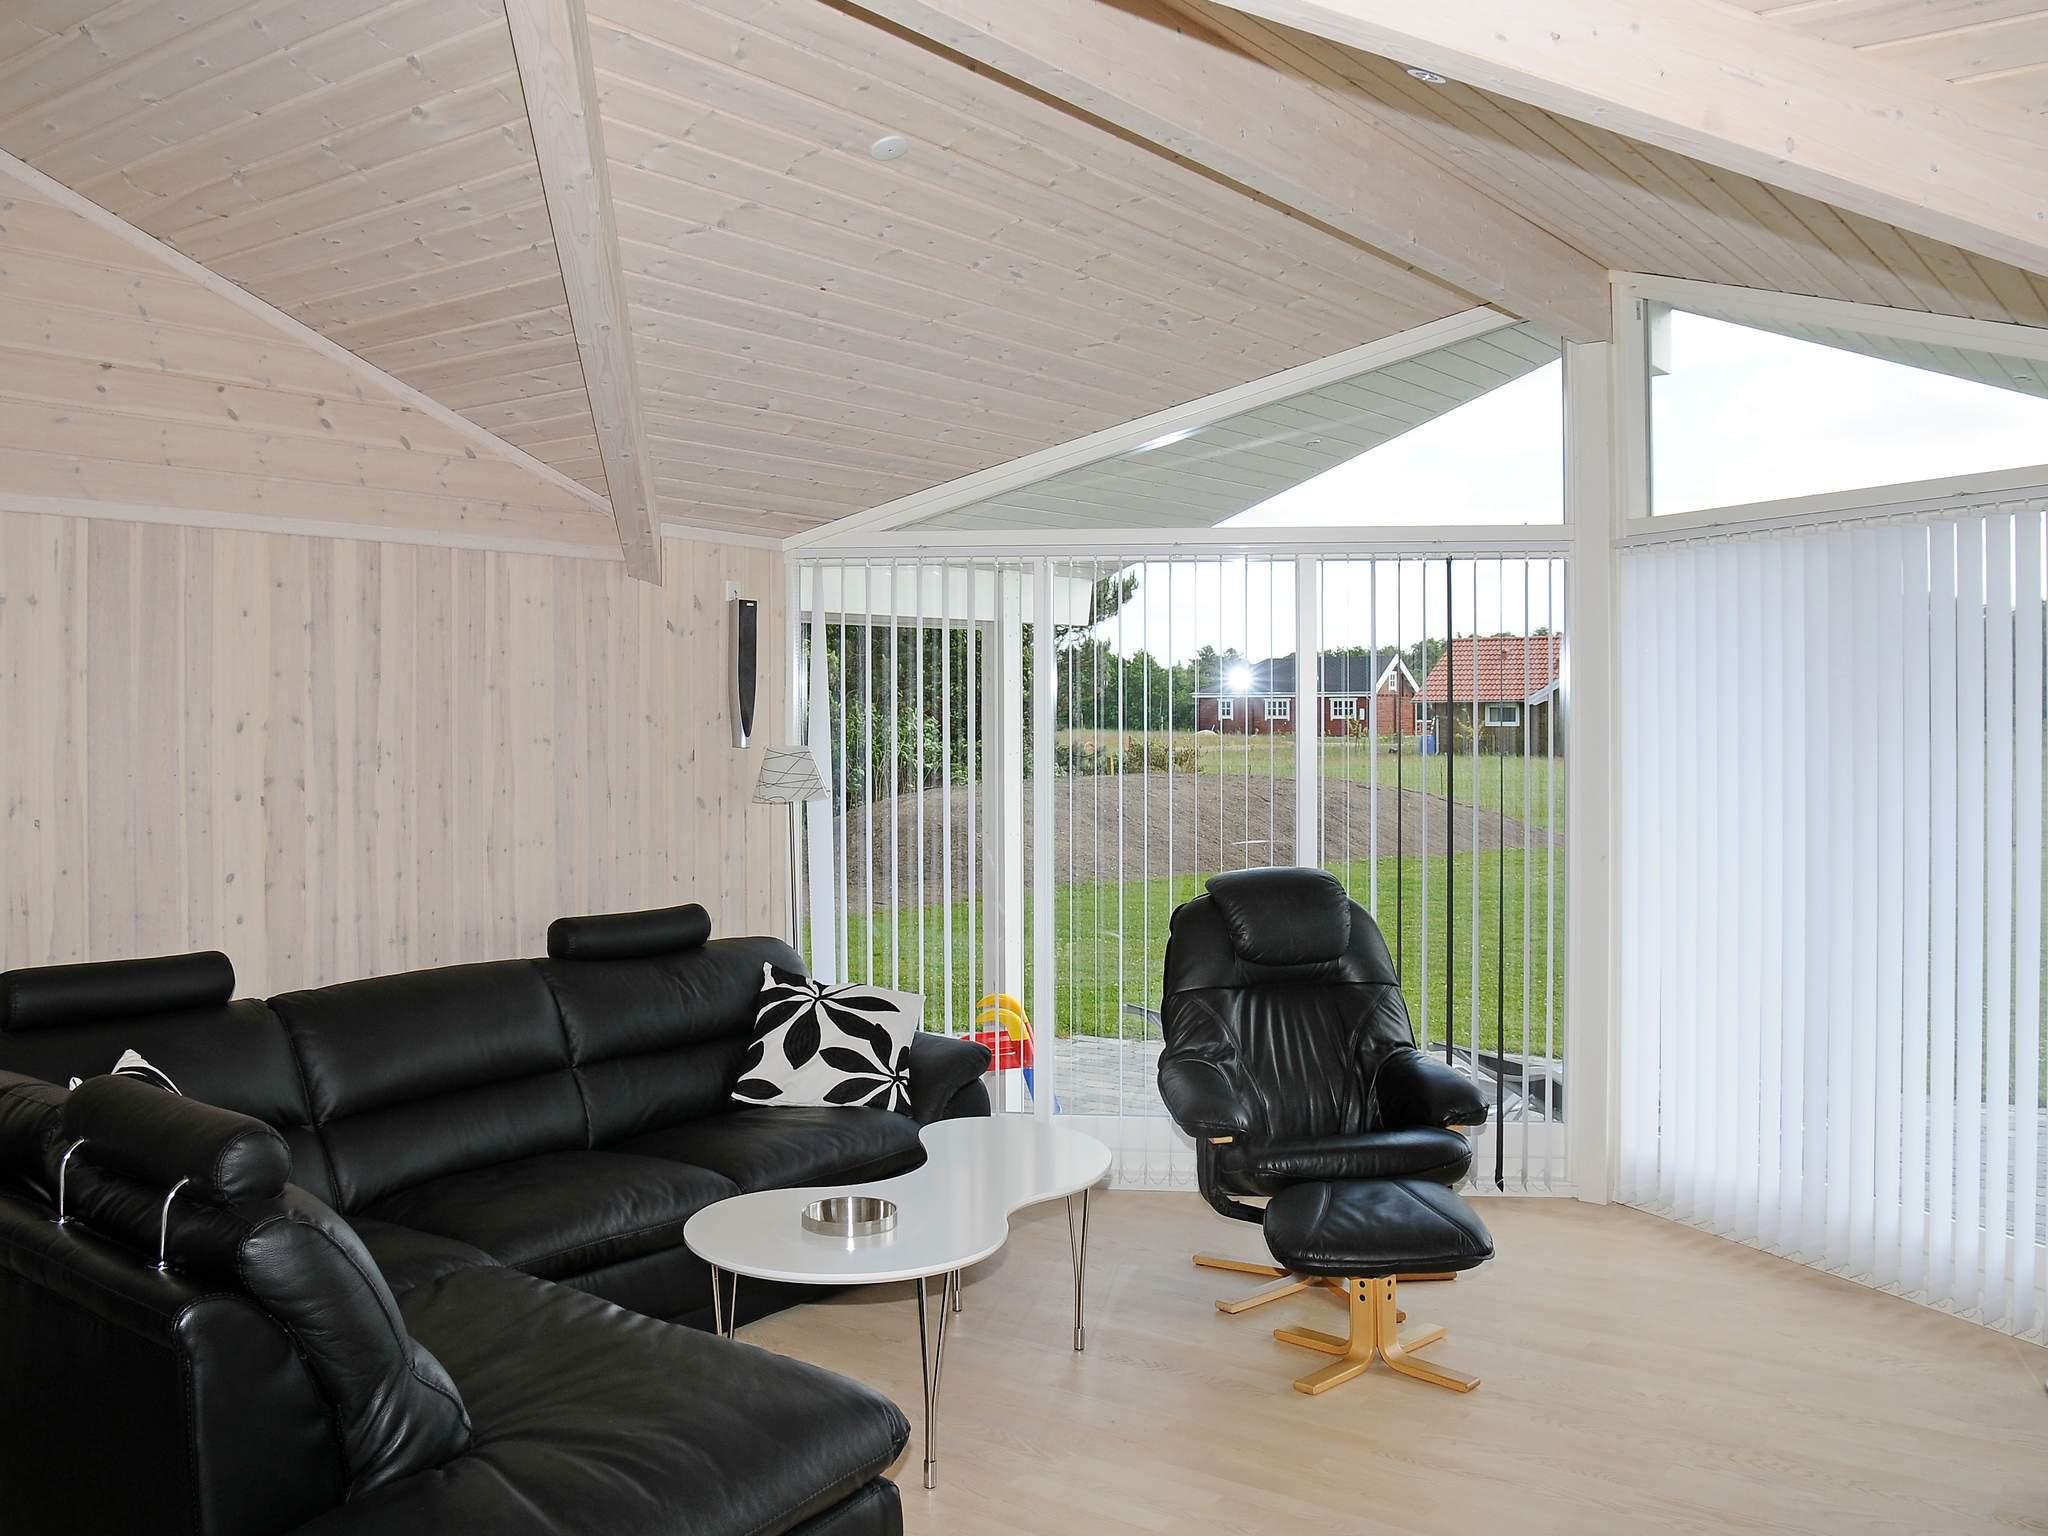 Ferienhaus Hovborg (344962), Hovborg, , Südwestjütland, Dänemark, Bild 2